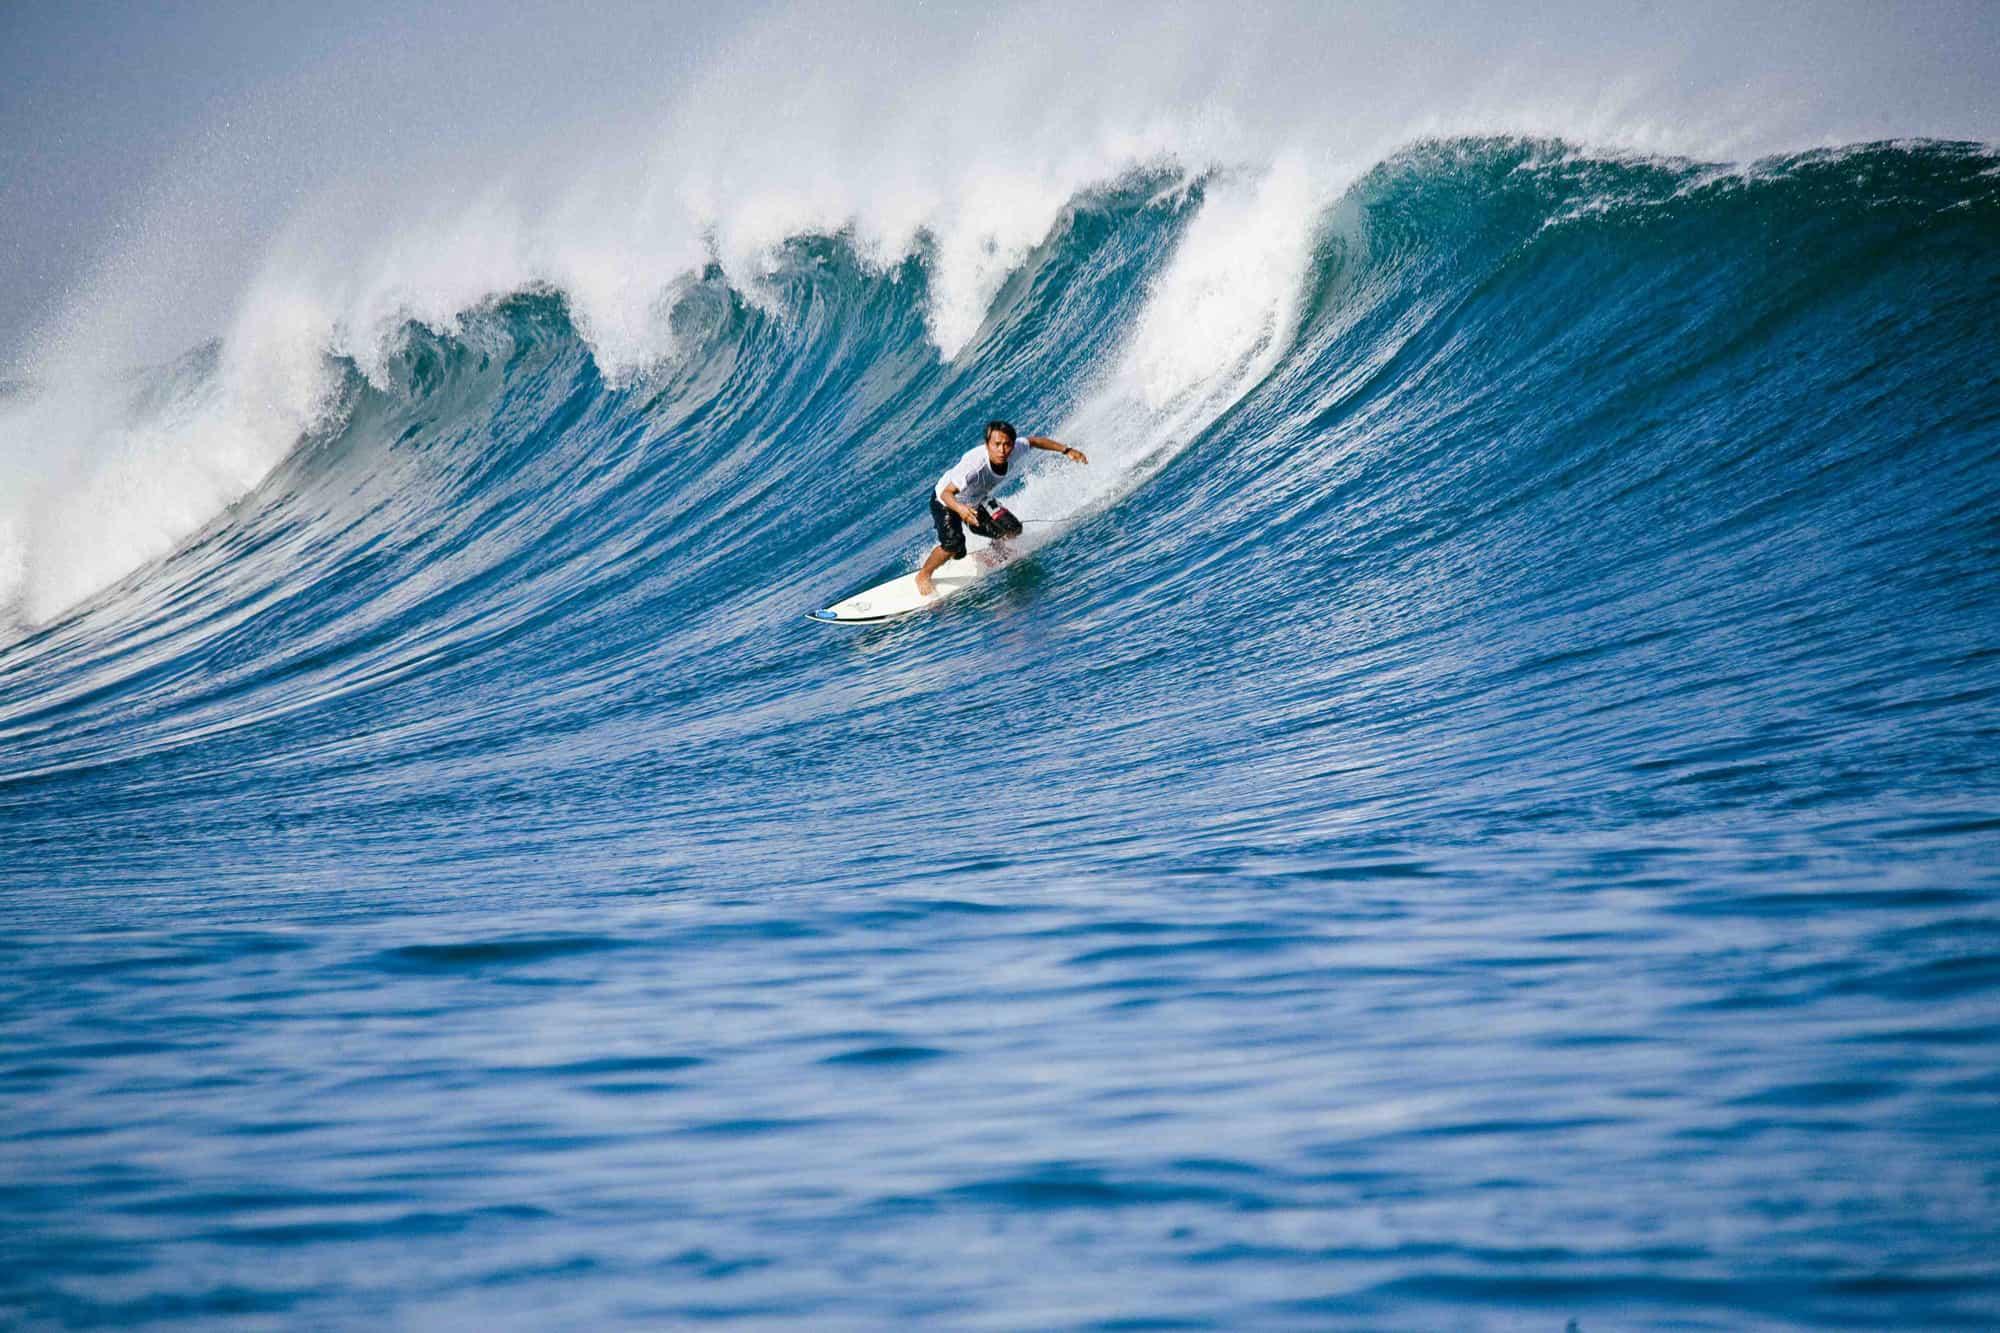 surf bali activite nautique sport pano